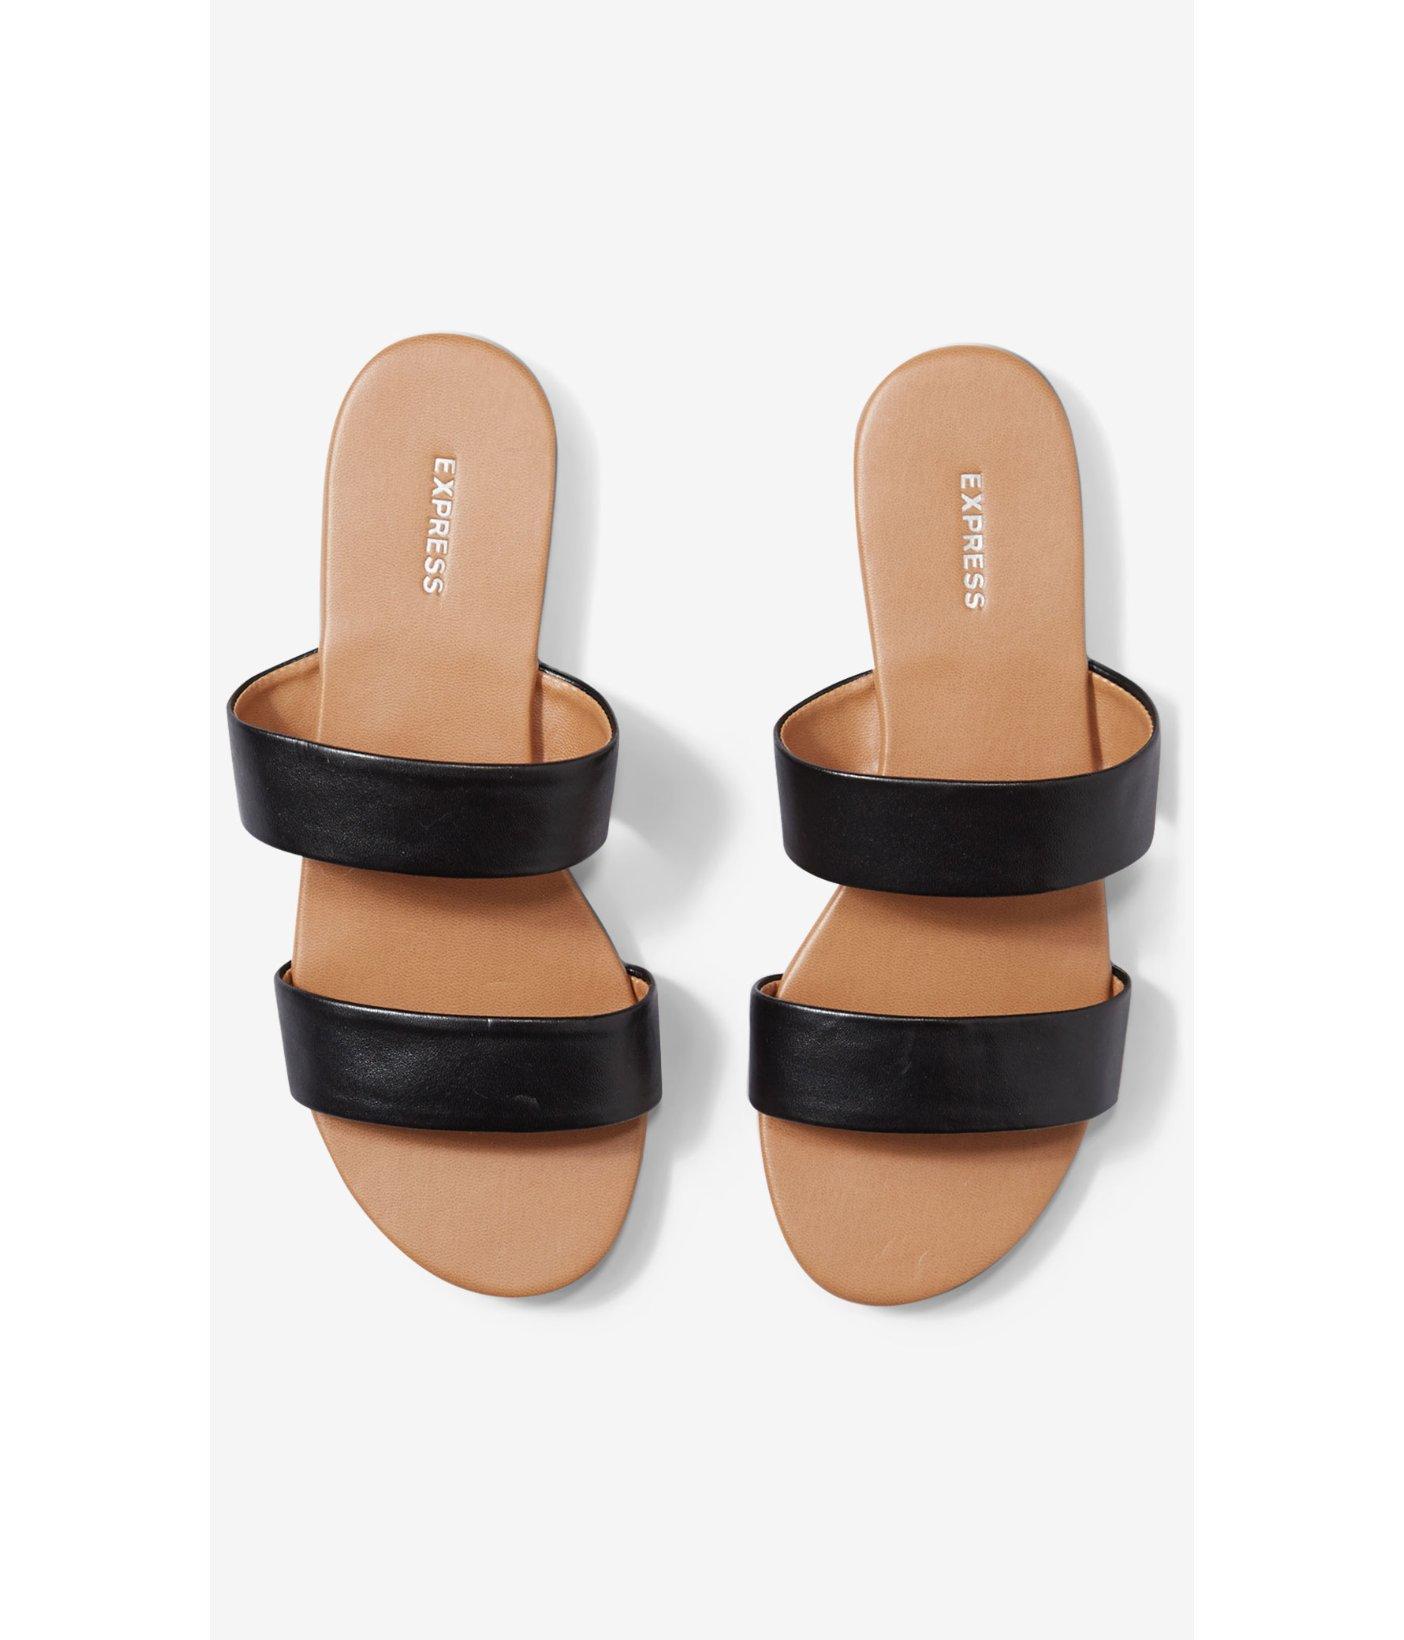 8946585129066 Lyst - Express Two Strap Slide Sandals in Black